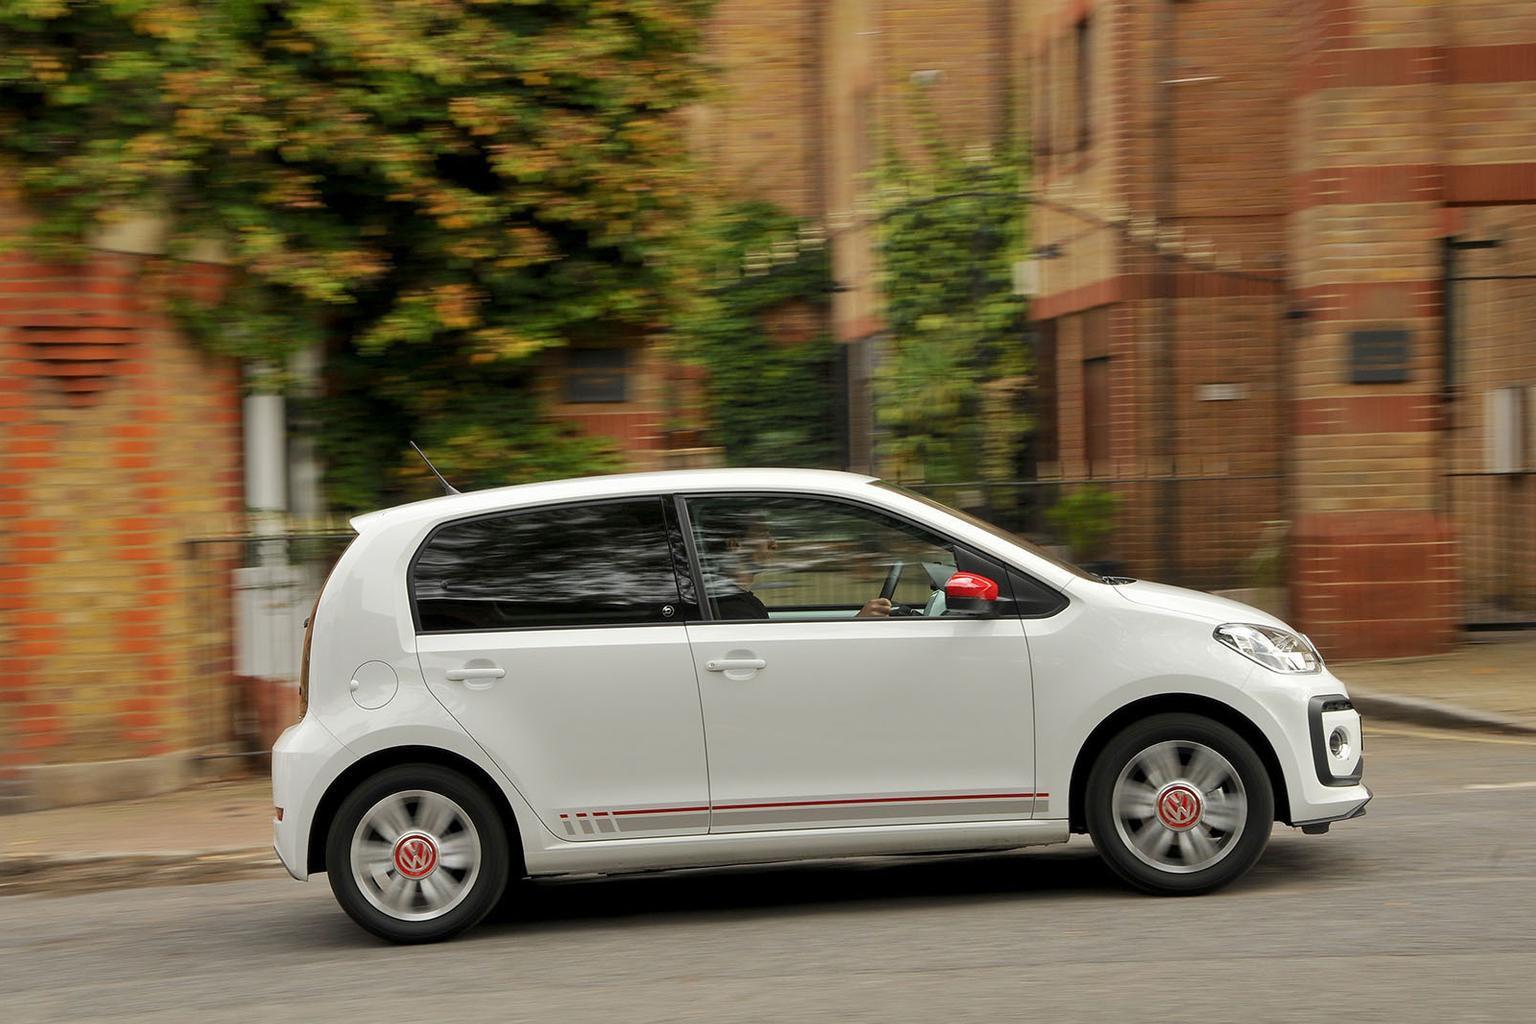 New Kia Picanto vs Volkswagen Up